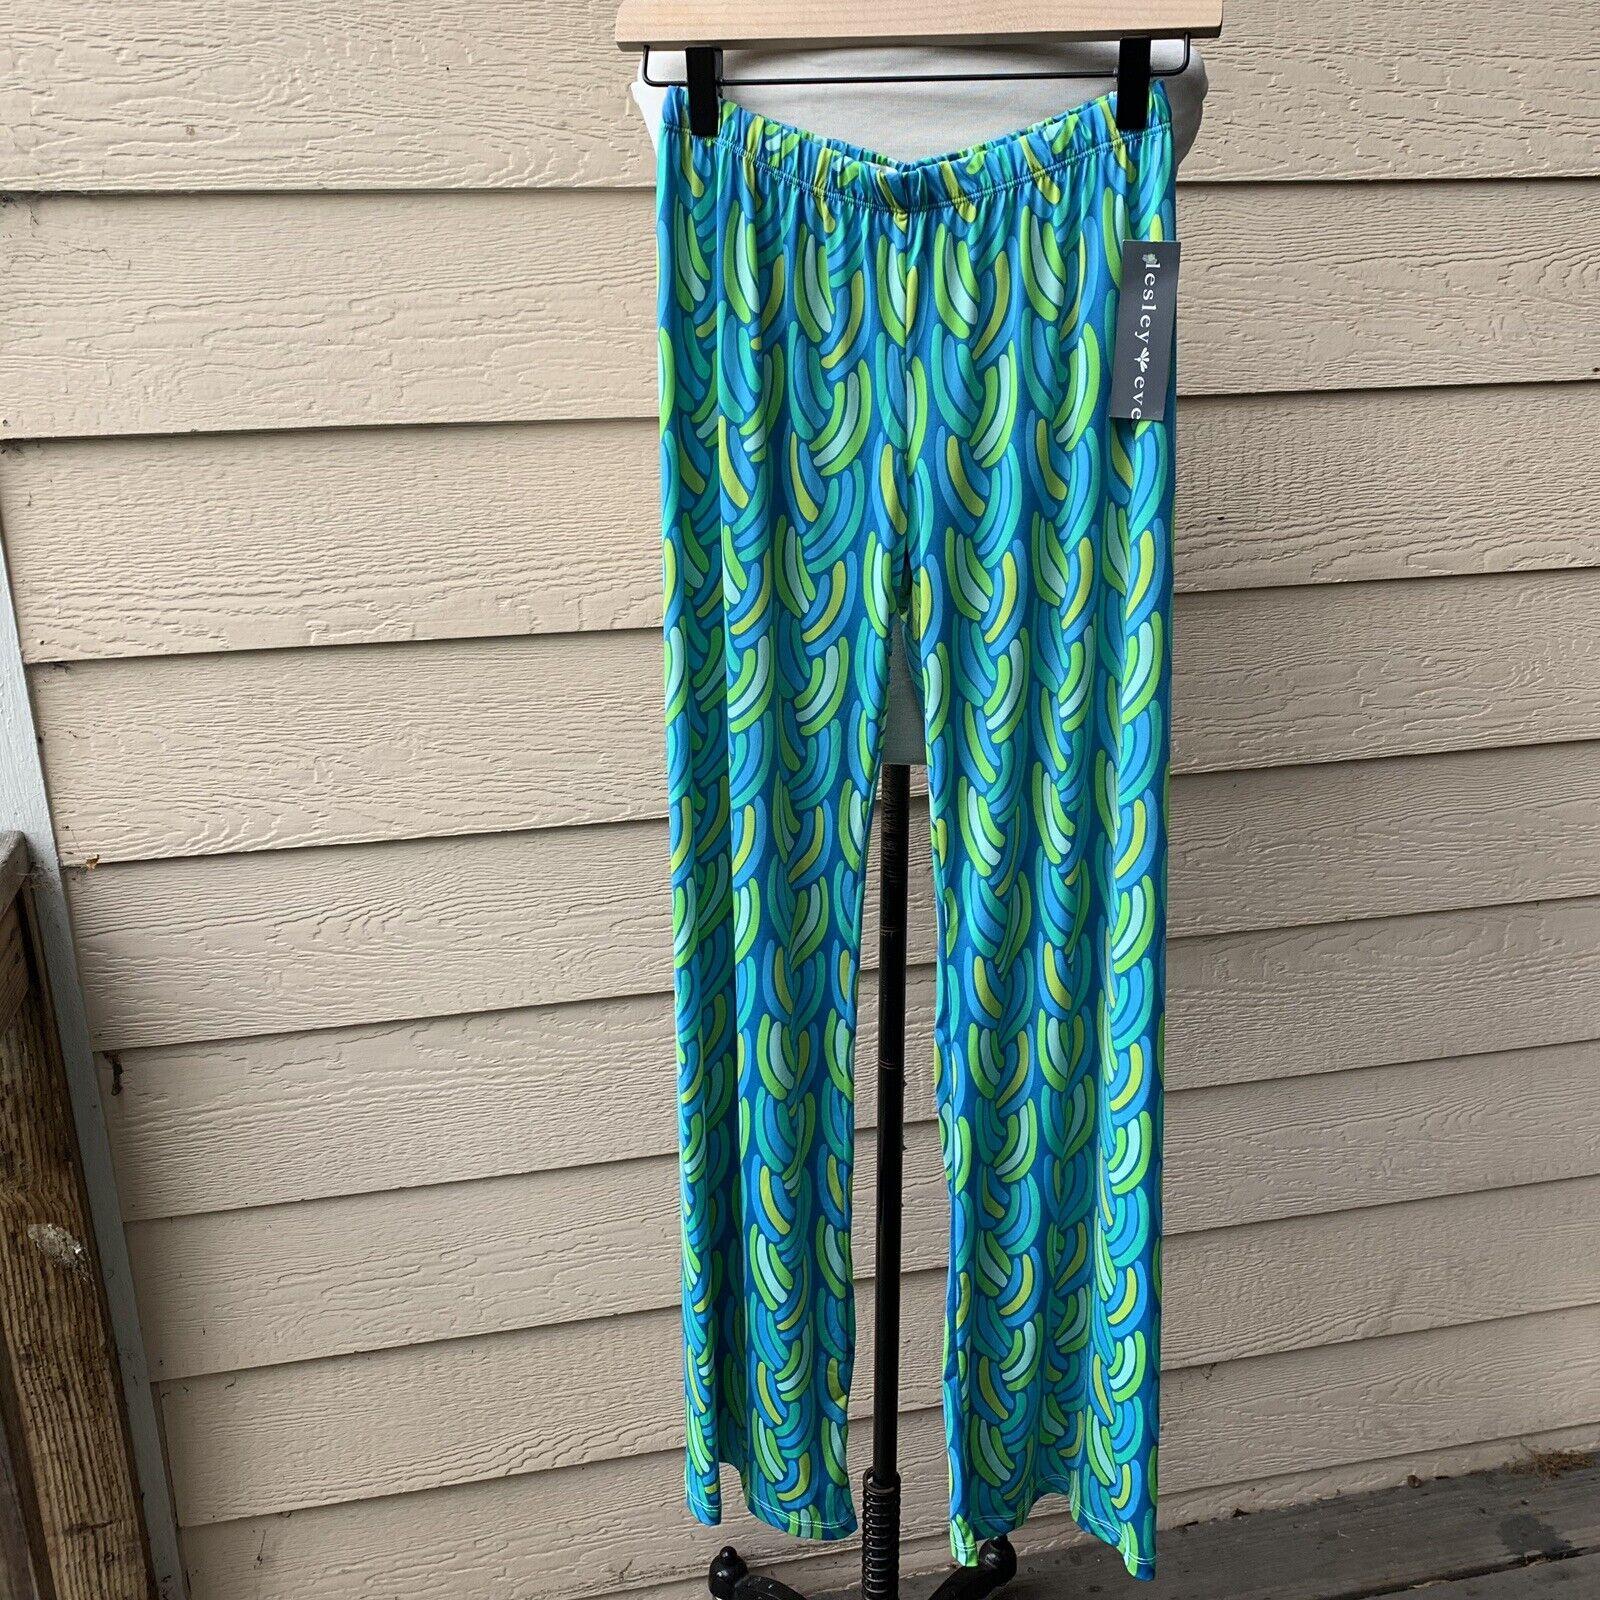 NWT Lesley Evers Cece Aqua Braids Blau Grün Stretchy Jersey Pants XS